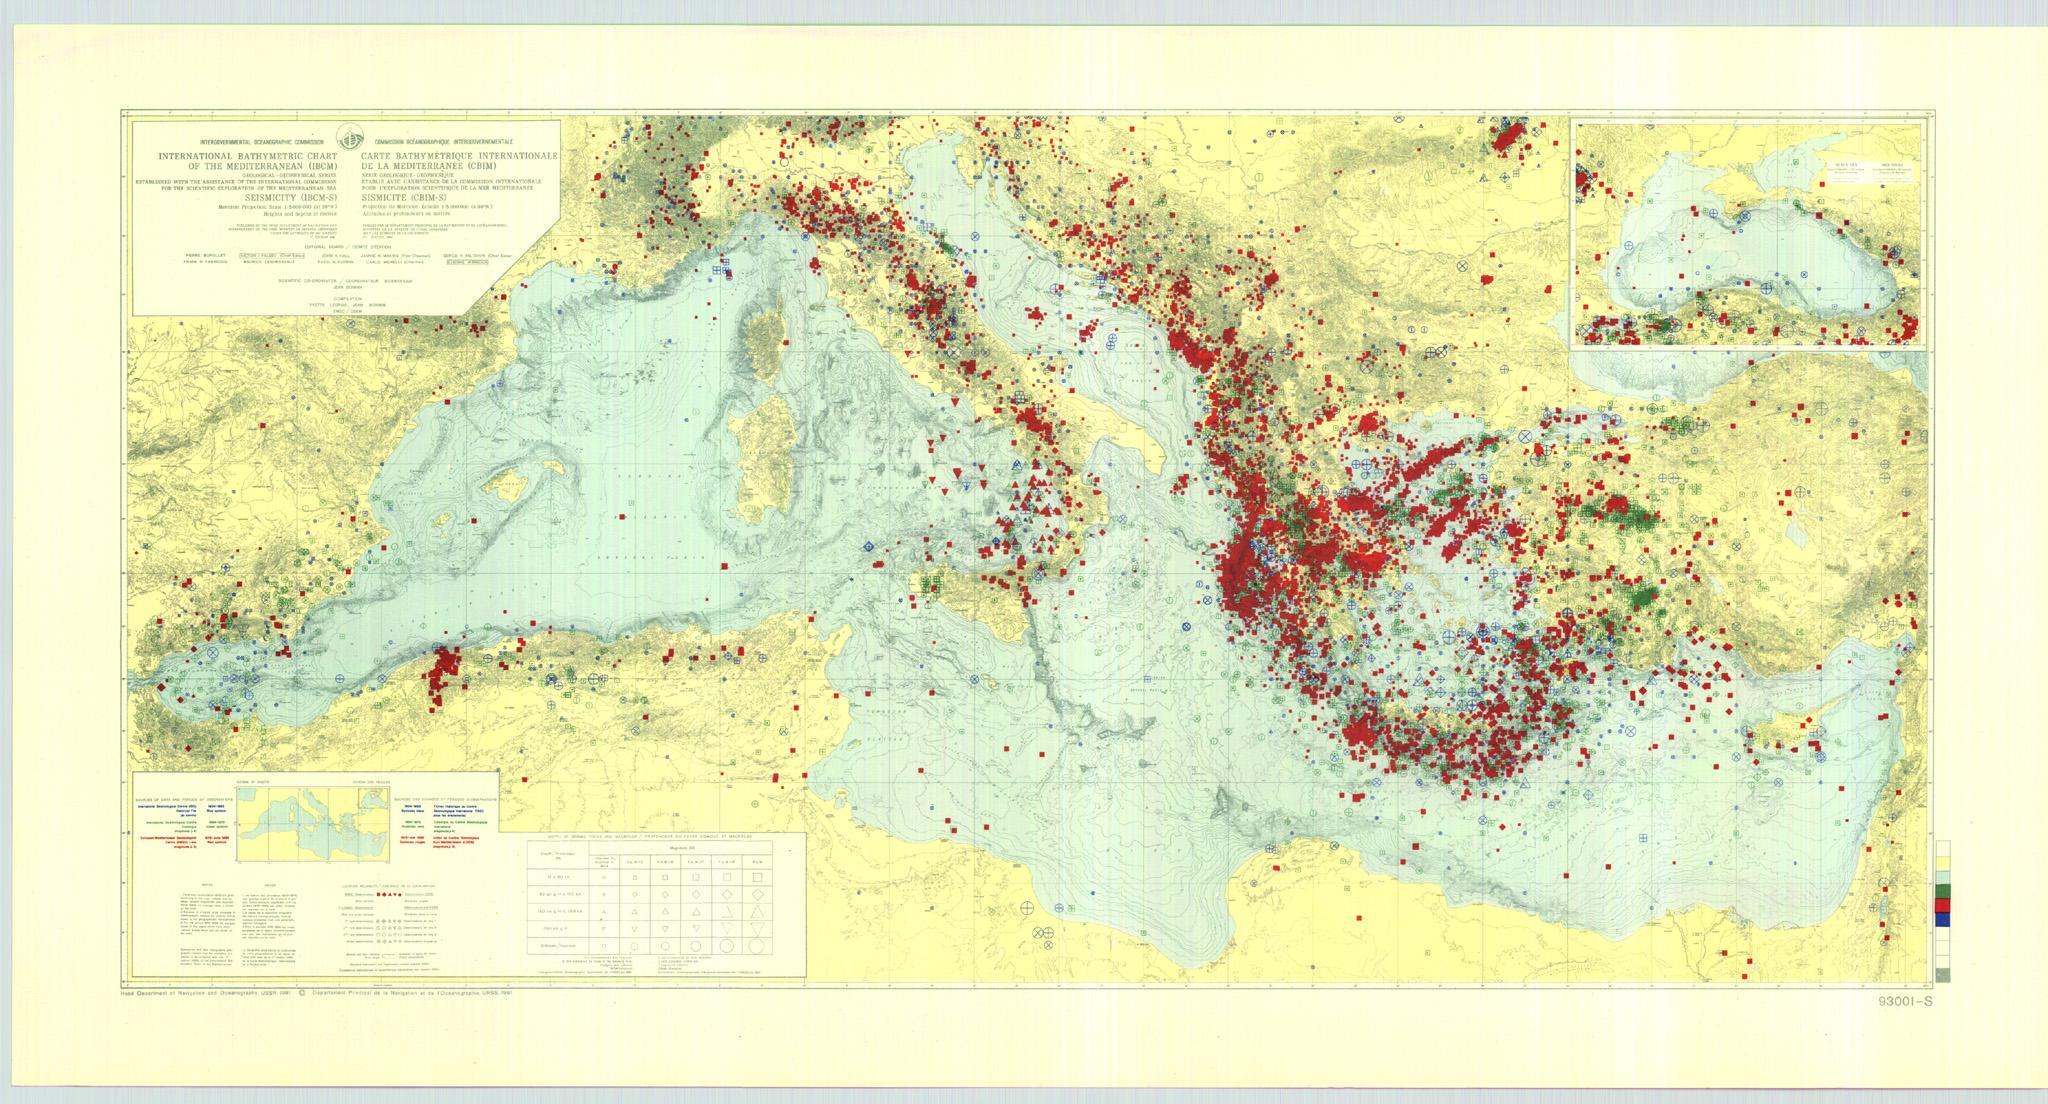 IOC IHO IBCM-International Bathymetric Chart of the Mediterranean | NCEI